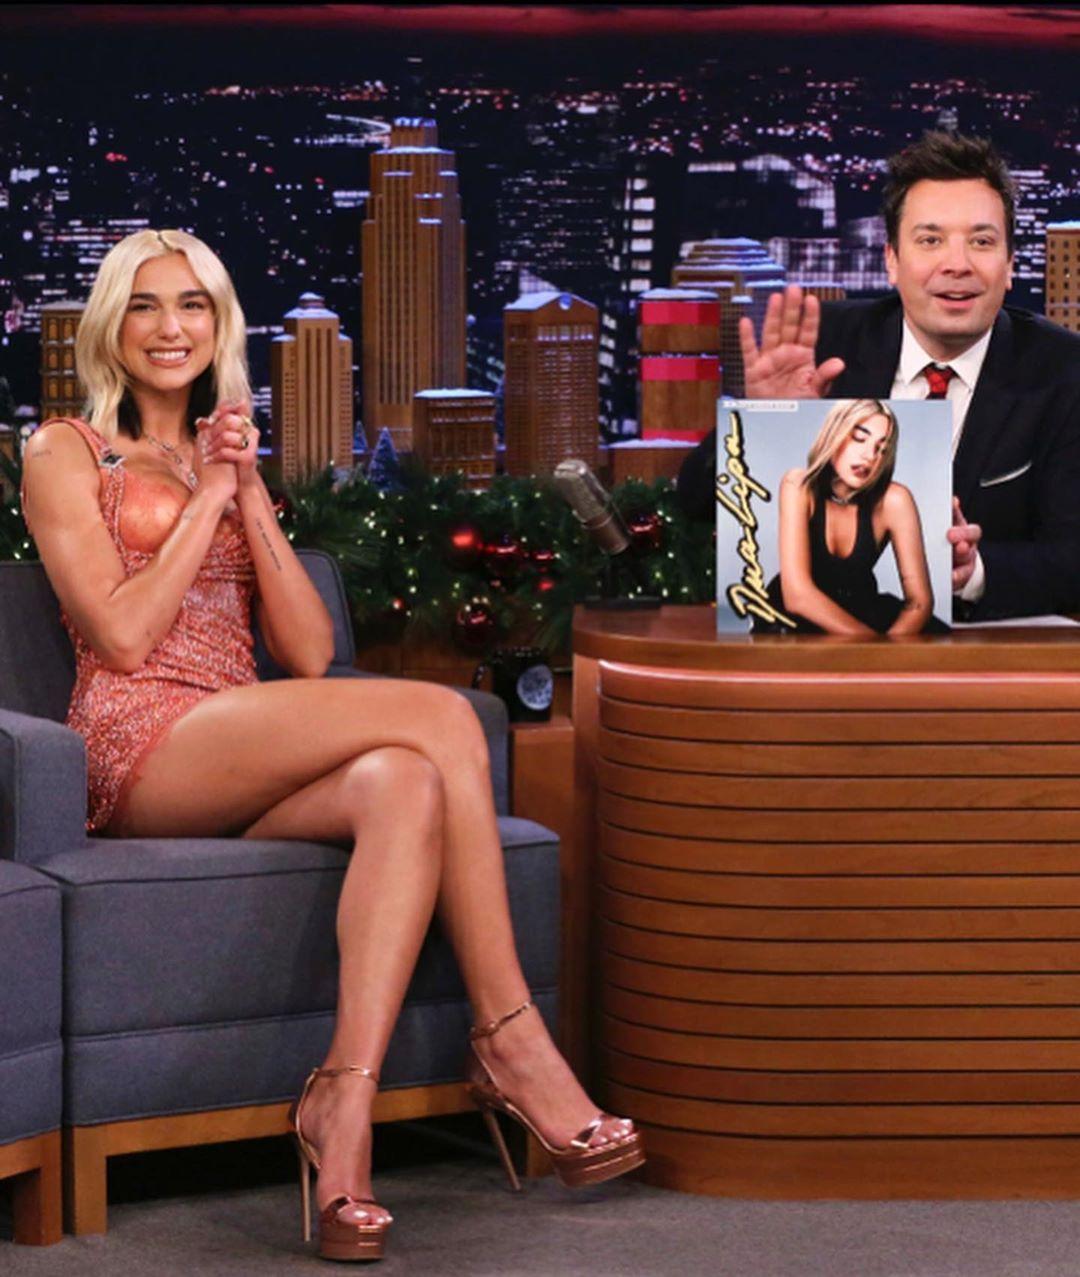 Dua Lipa on the Tonight Show with Jimmy Fallon